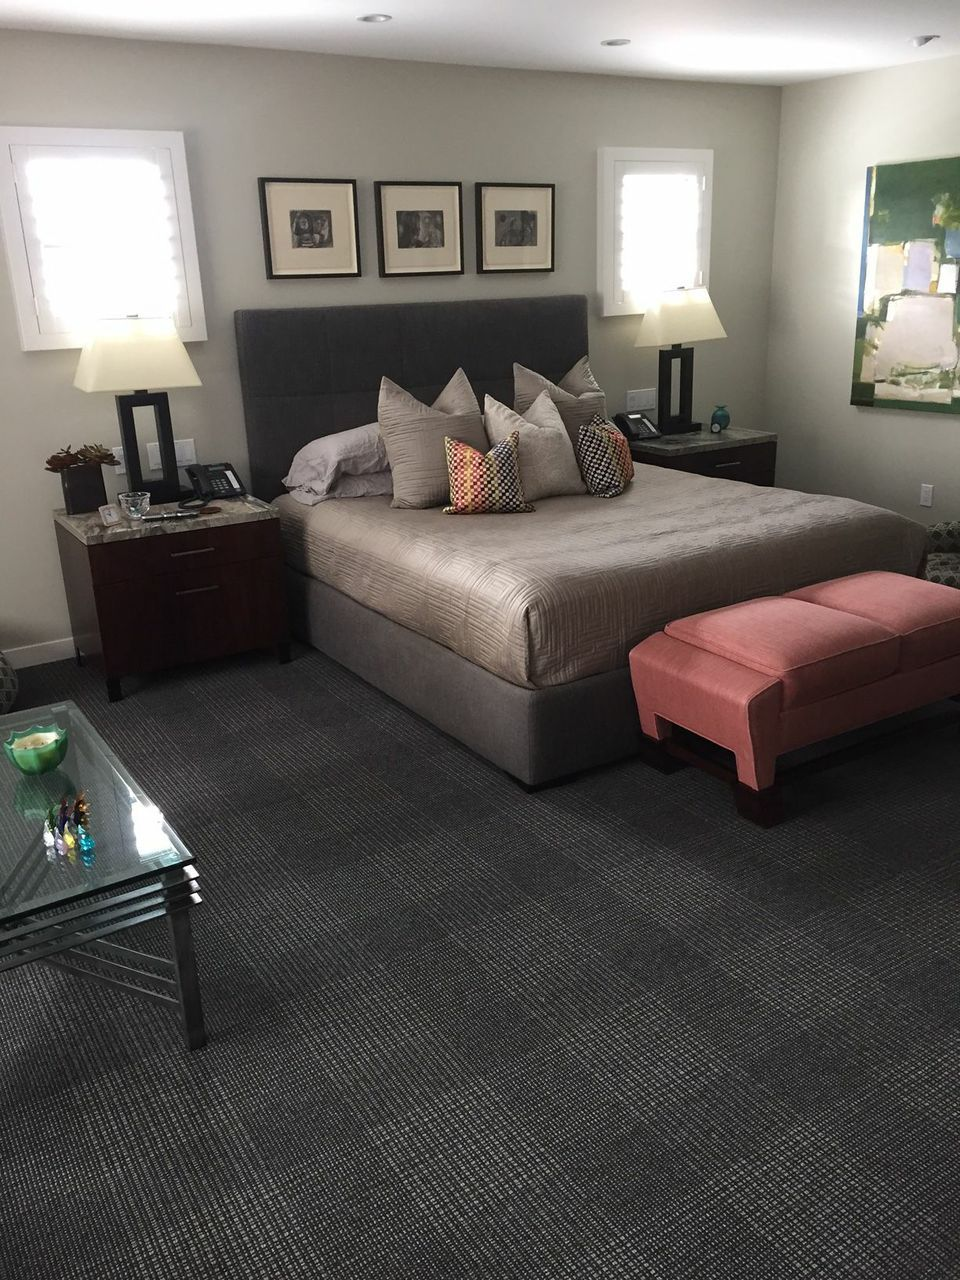 Bedroom By Luke Hamilton Design Using Starks Brigade Carpet Style In Color Twilight StarkTouch